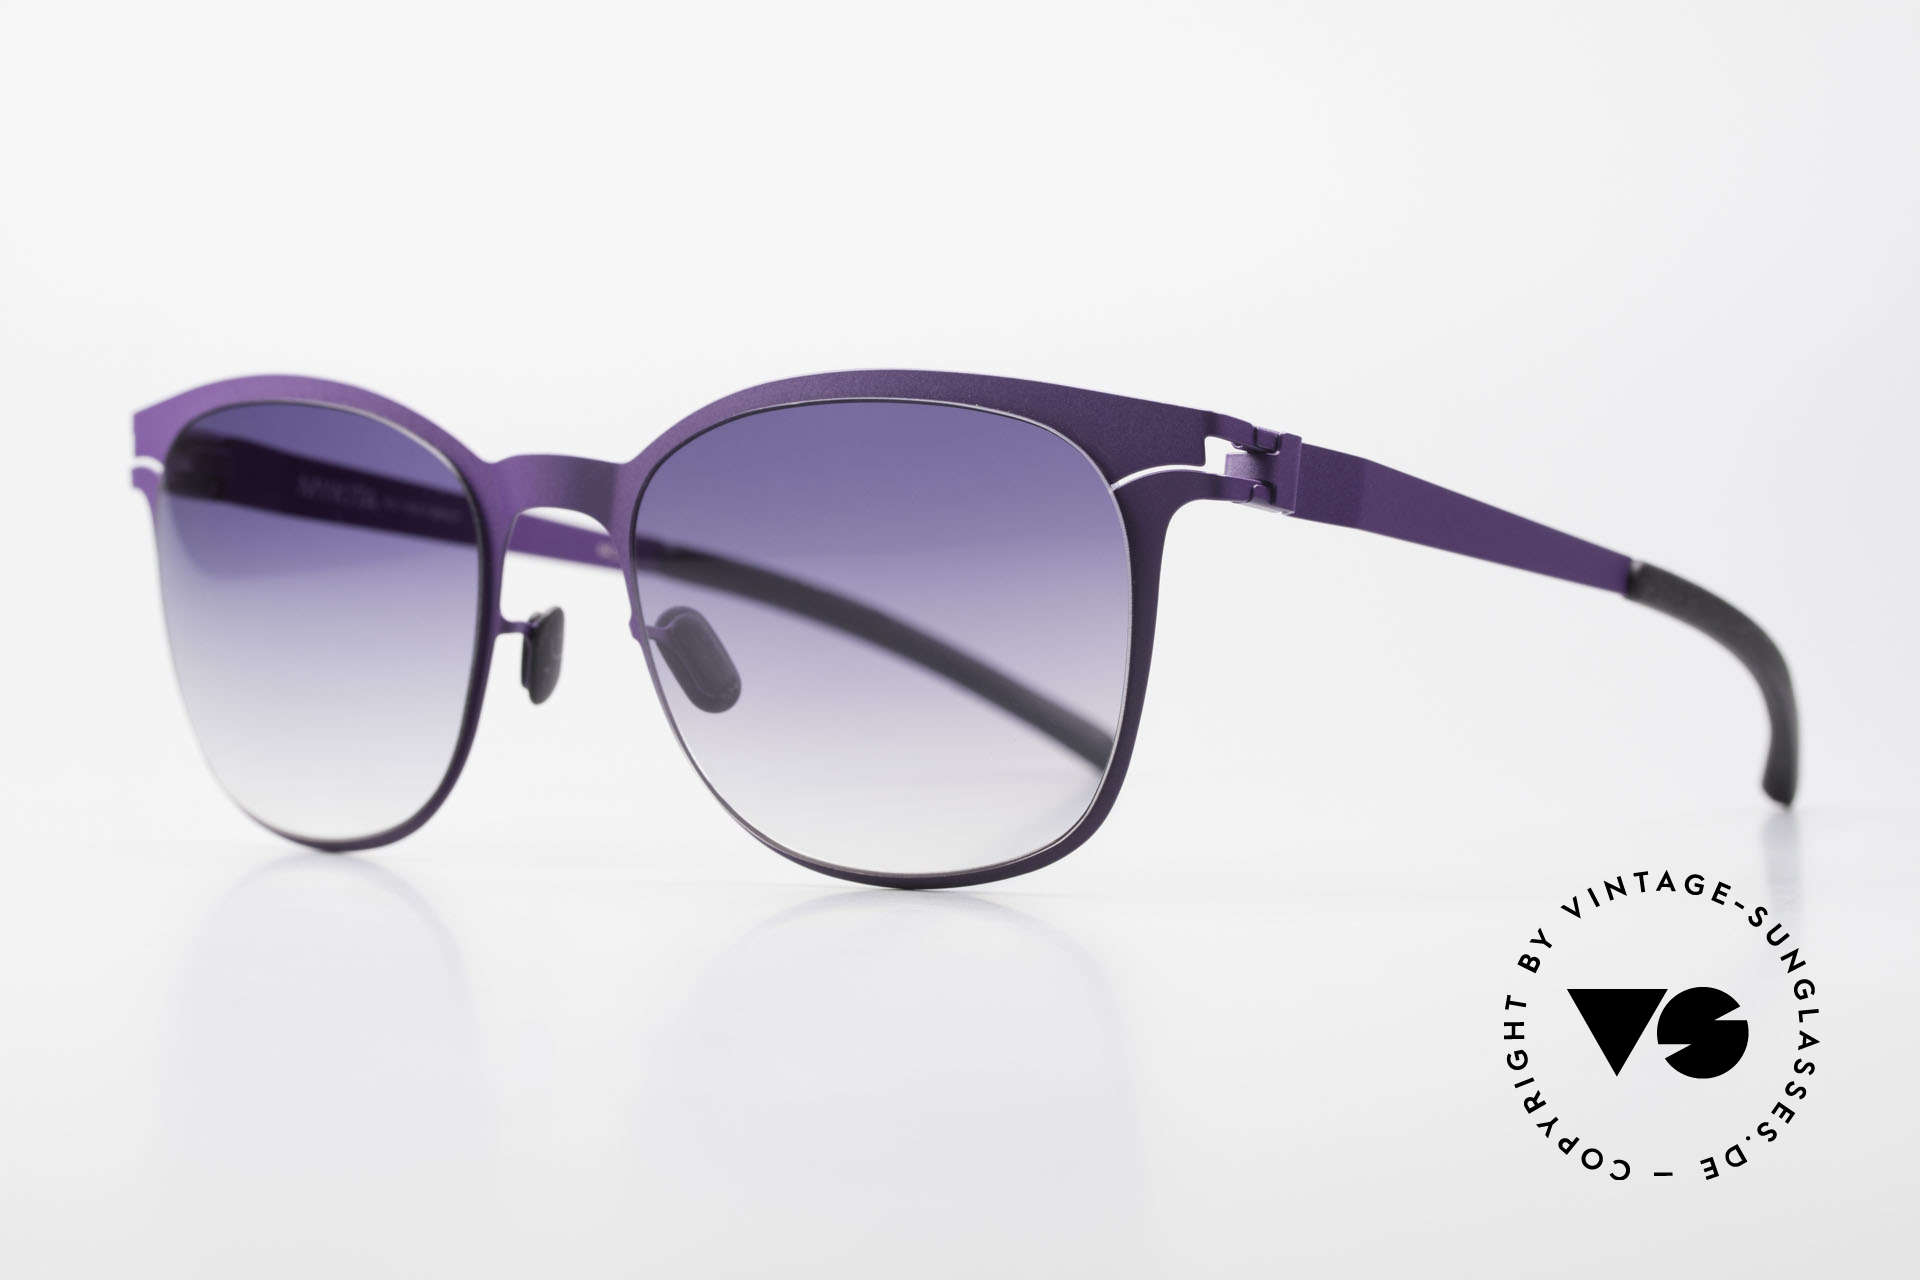 Mykita Greta Ladies Designer Sunglasses, Collection No.1 GRETA Violet, violet-gradient, 54/20, Made for Women